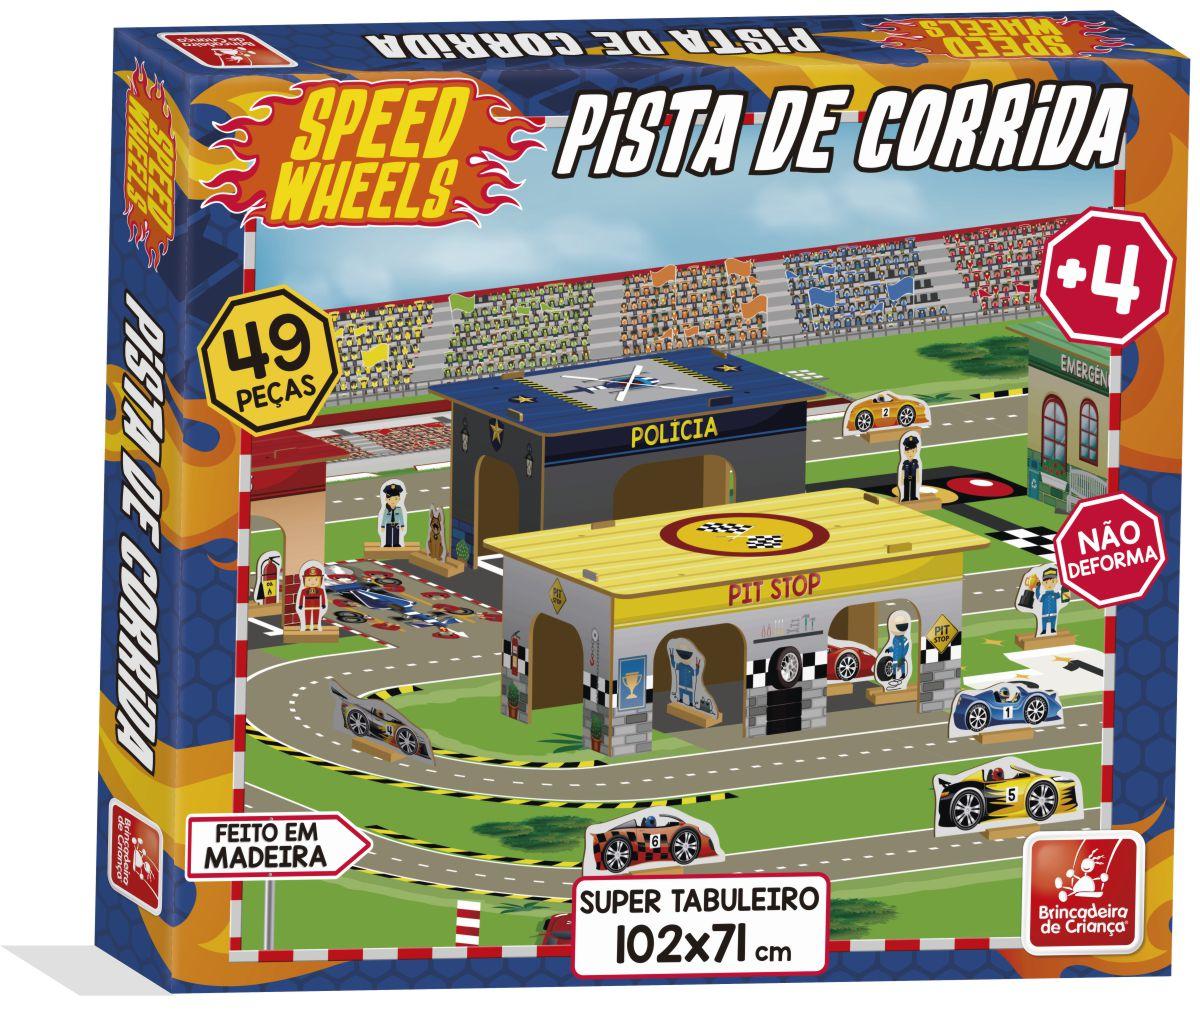 Pista de Corrida - Speed Wheels - Brincadeira de Criança